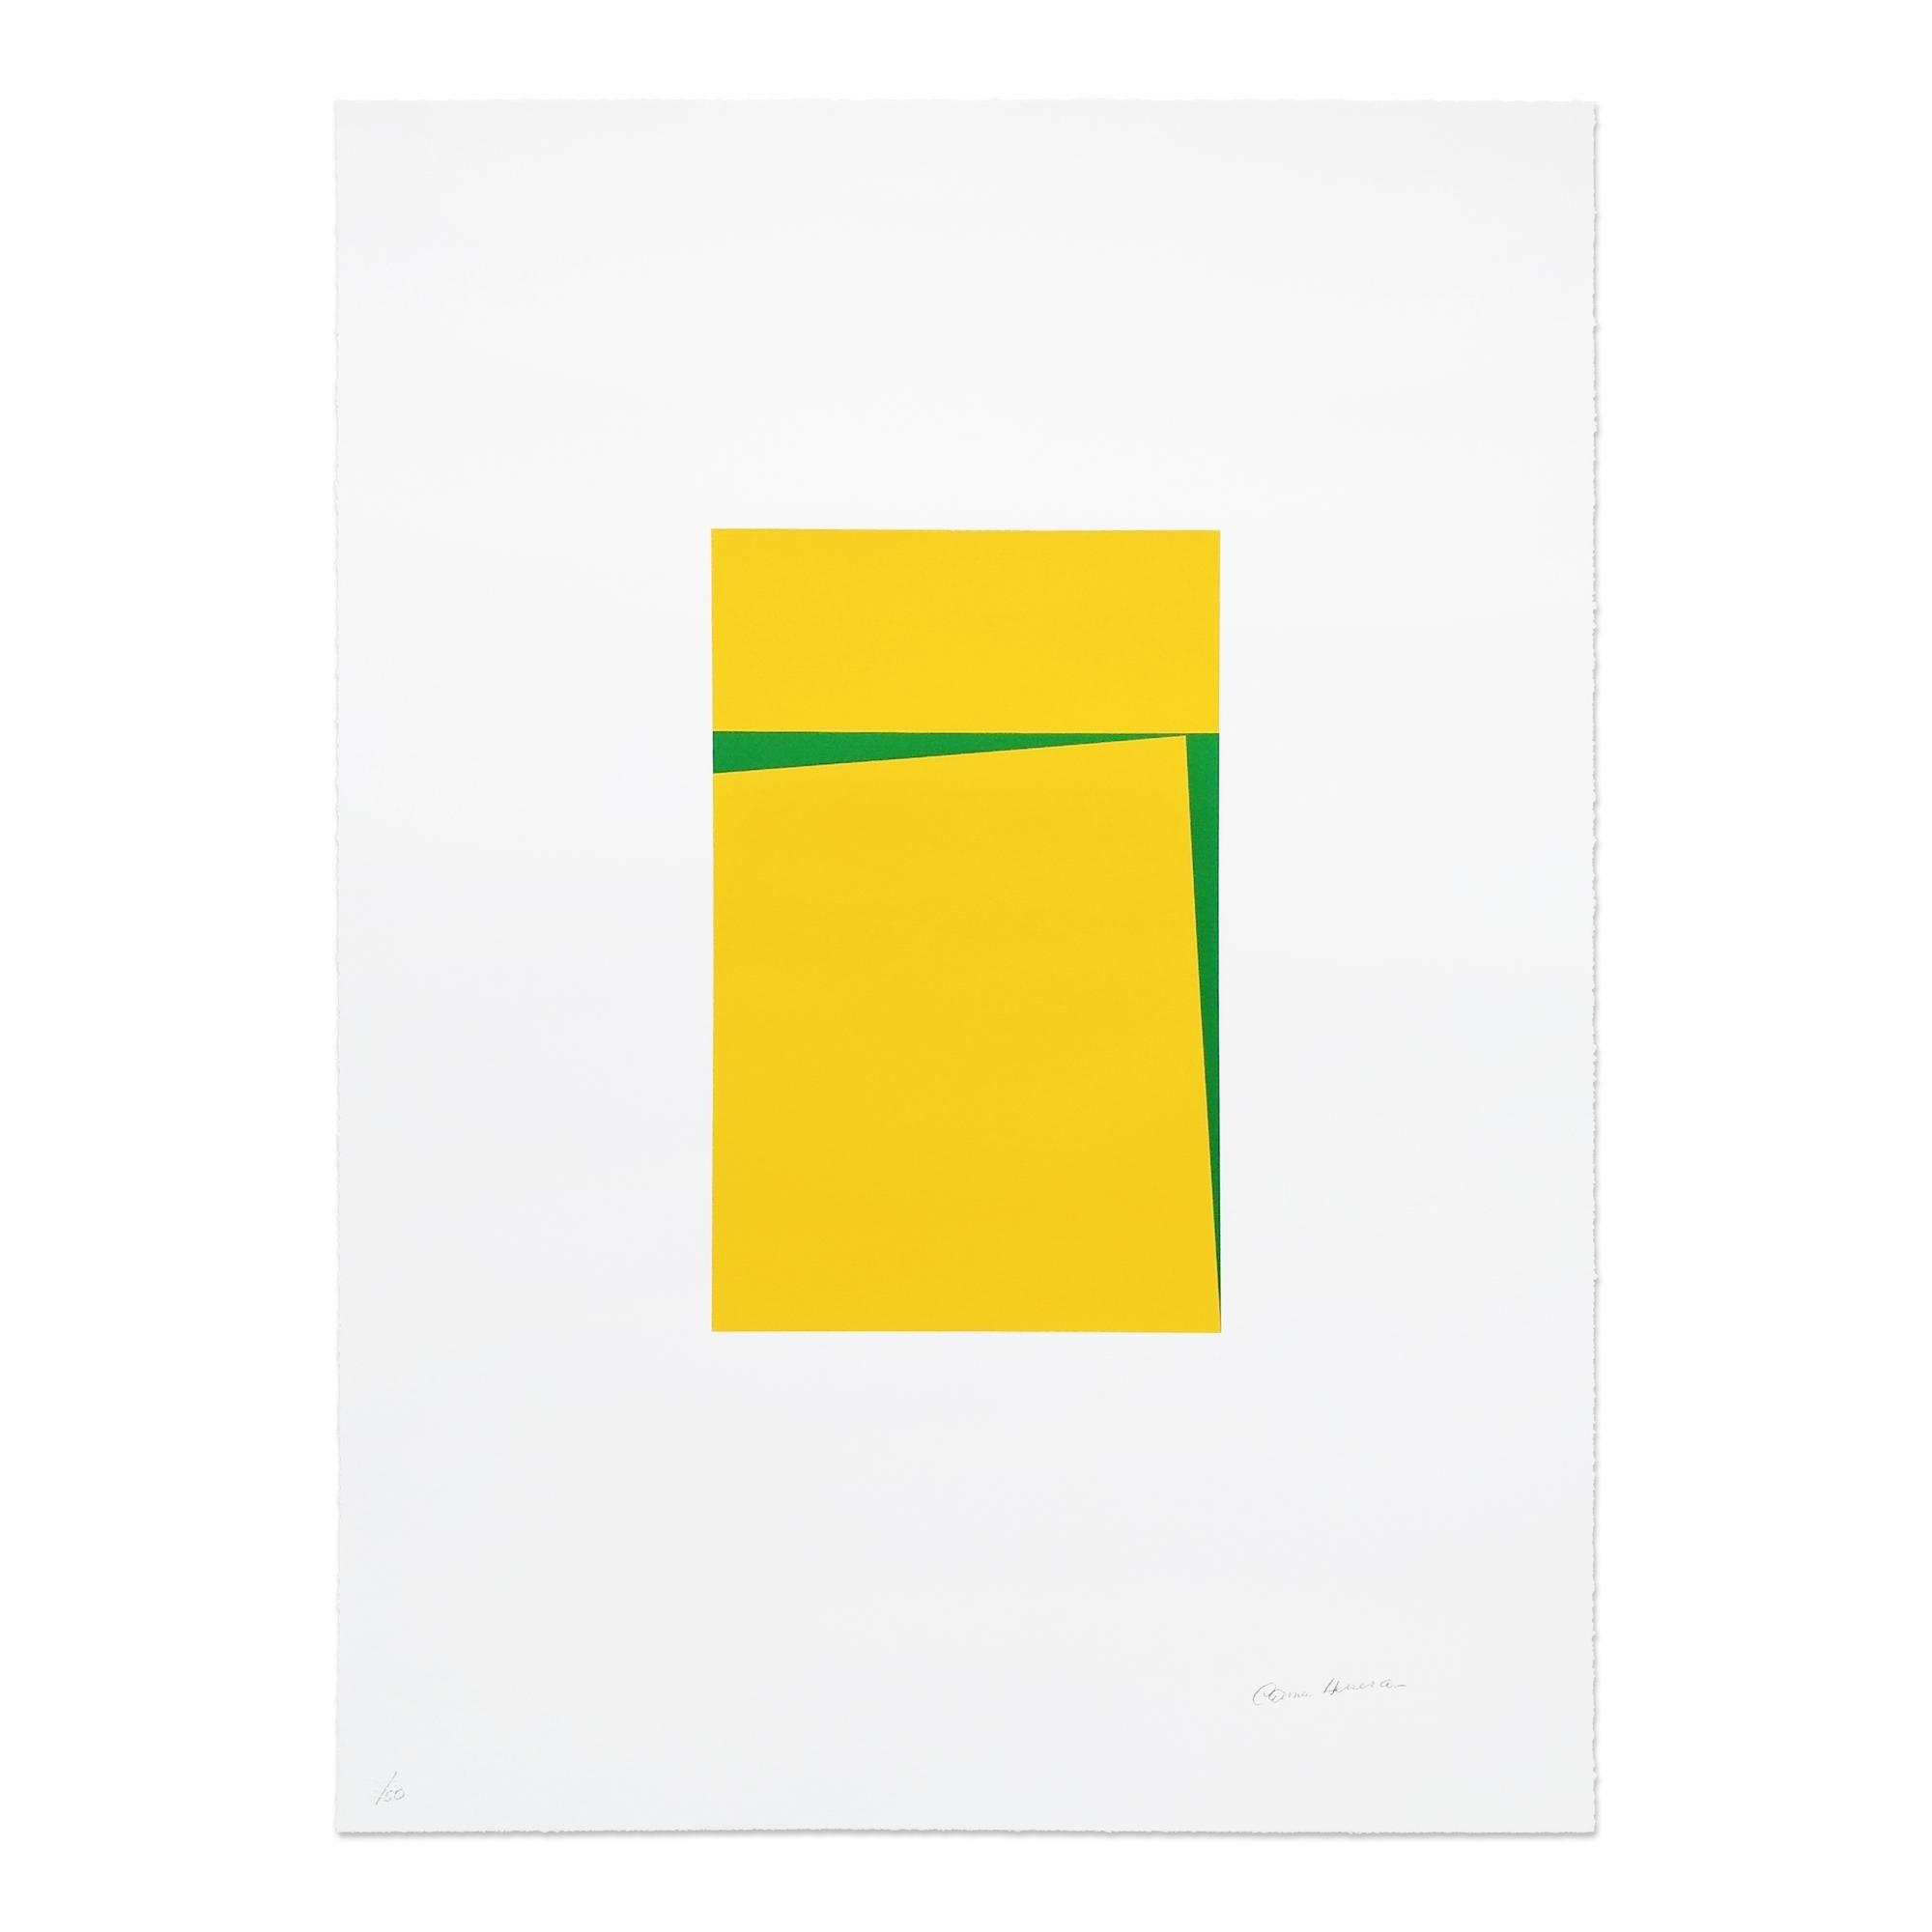 Untitled, Silkscreen, Abstract Artist, Geometric, Minimalism, Hard-Edge